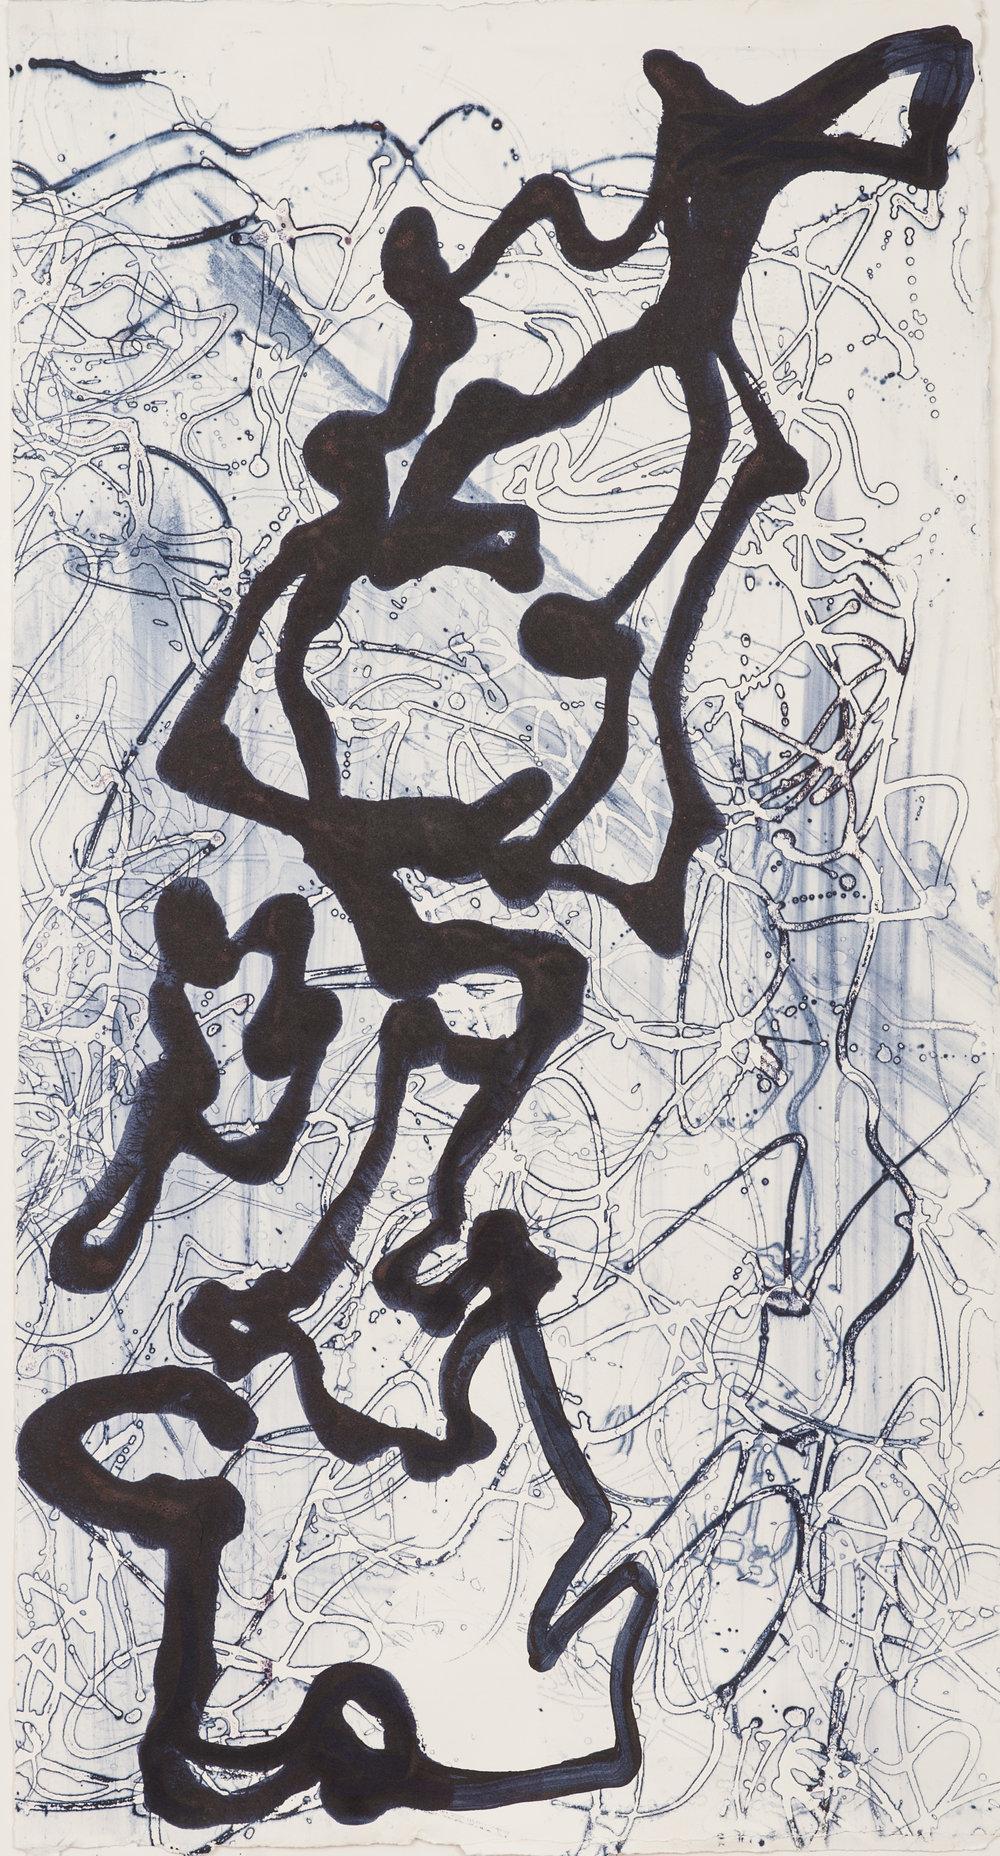 "Graffiti IV, 17"" X 31"", silkscreen painting on paper, 2016"